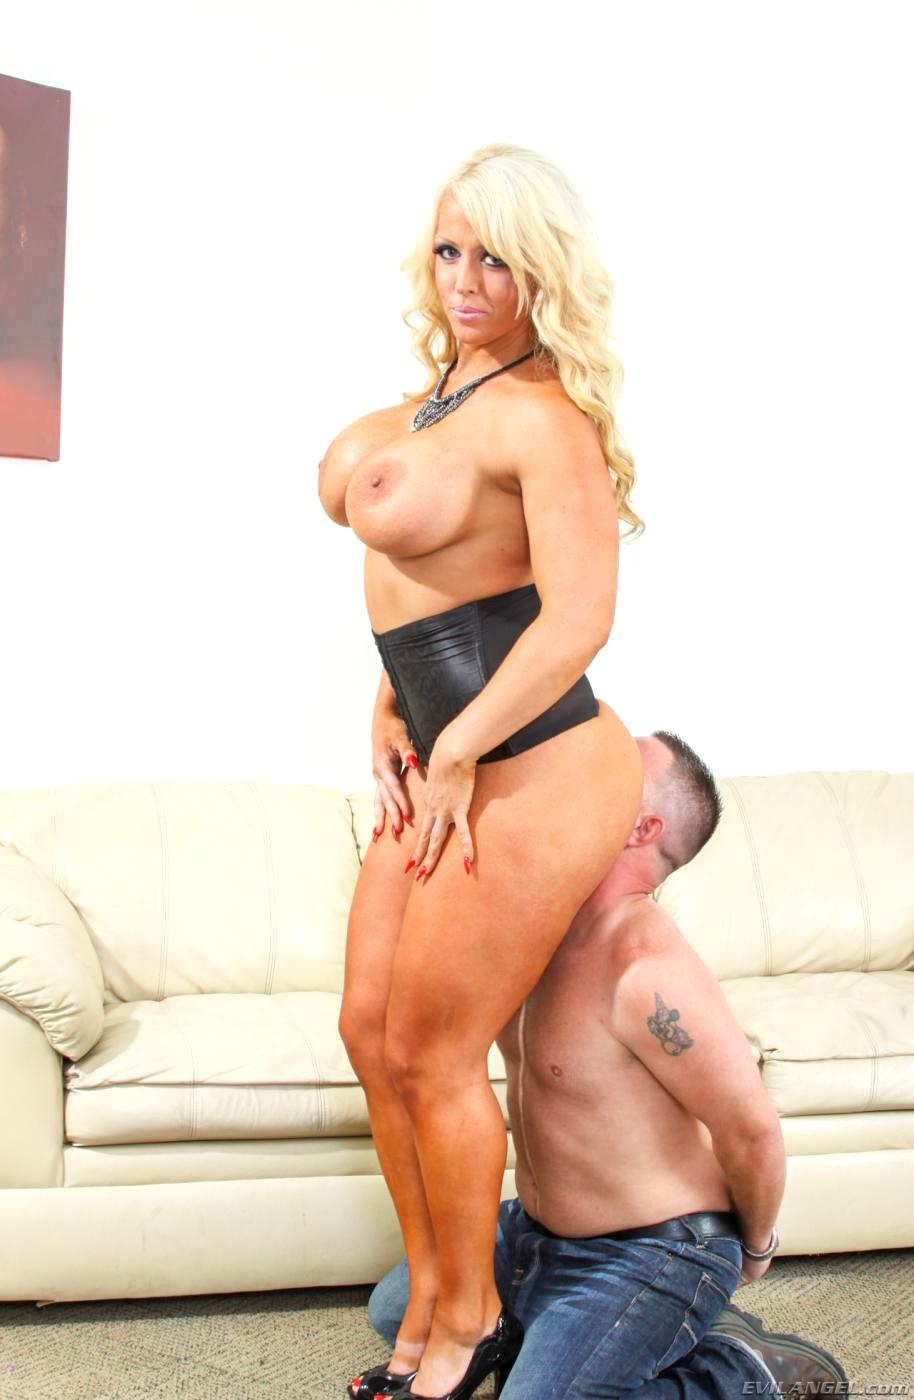 Babe Today Evil Angel Alura Jenson Latest Milf Galaxy Porn -8016